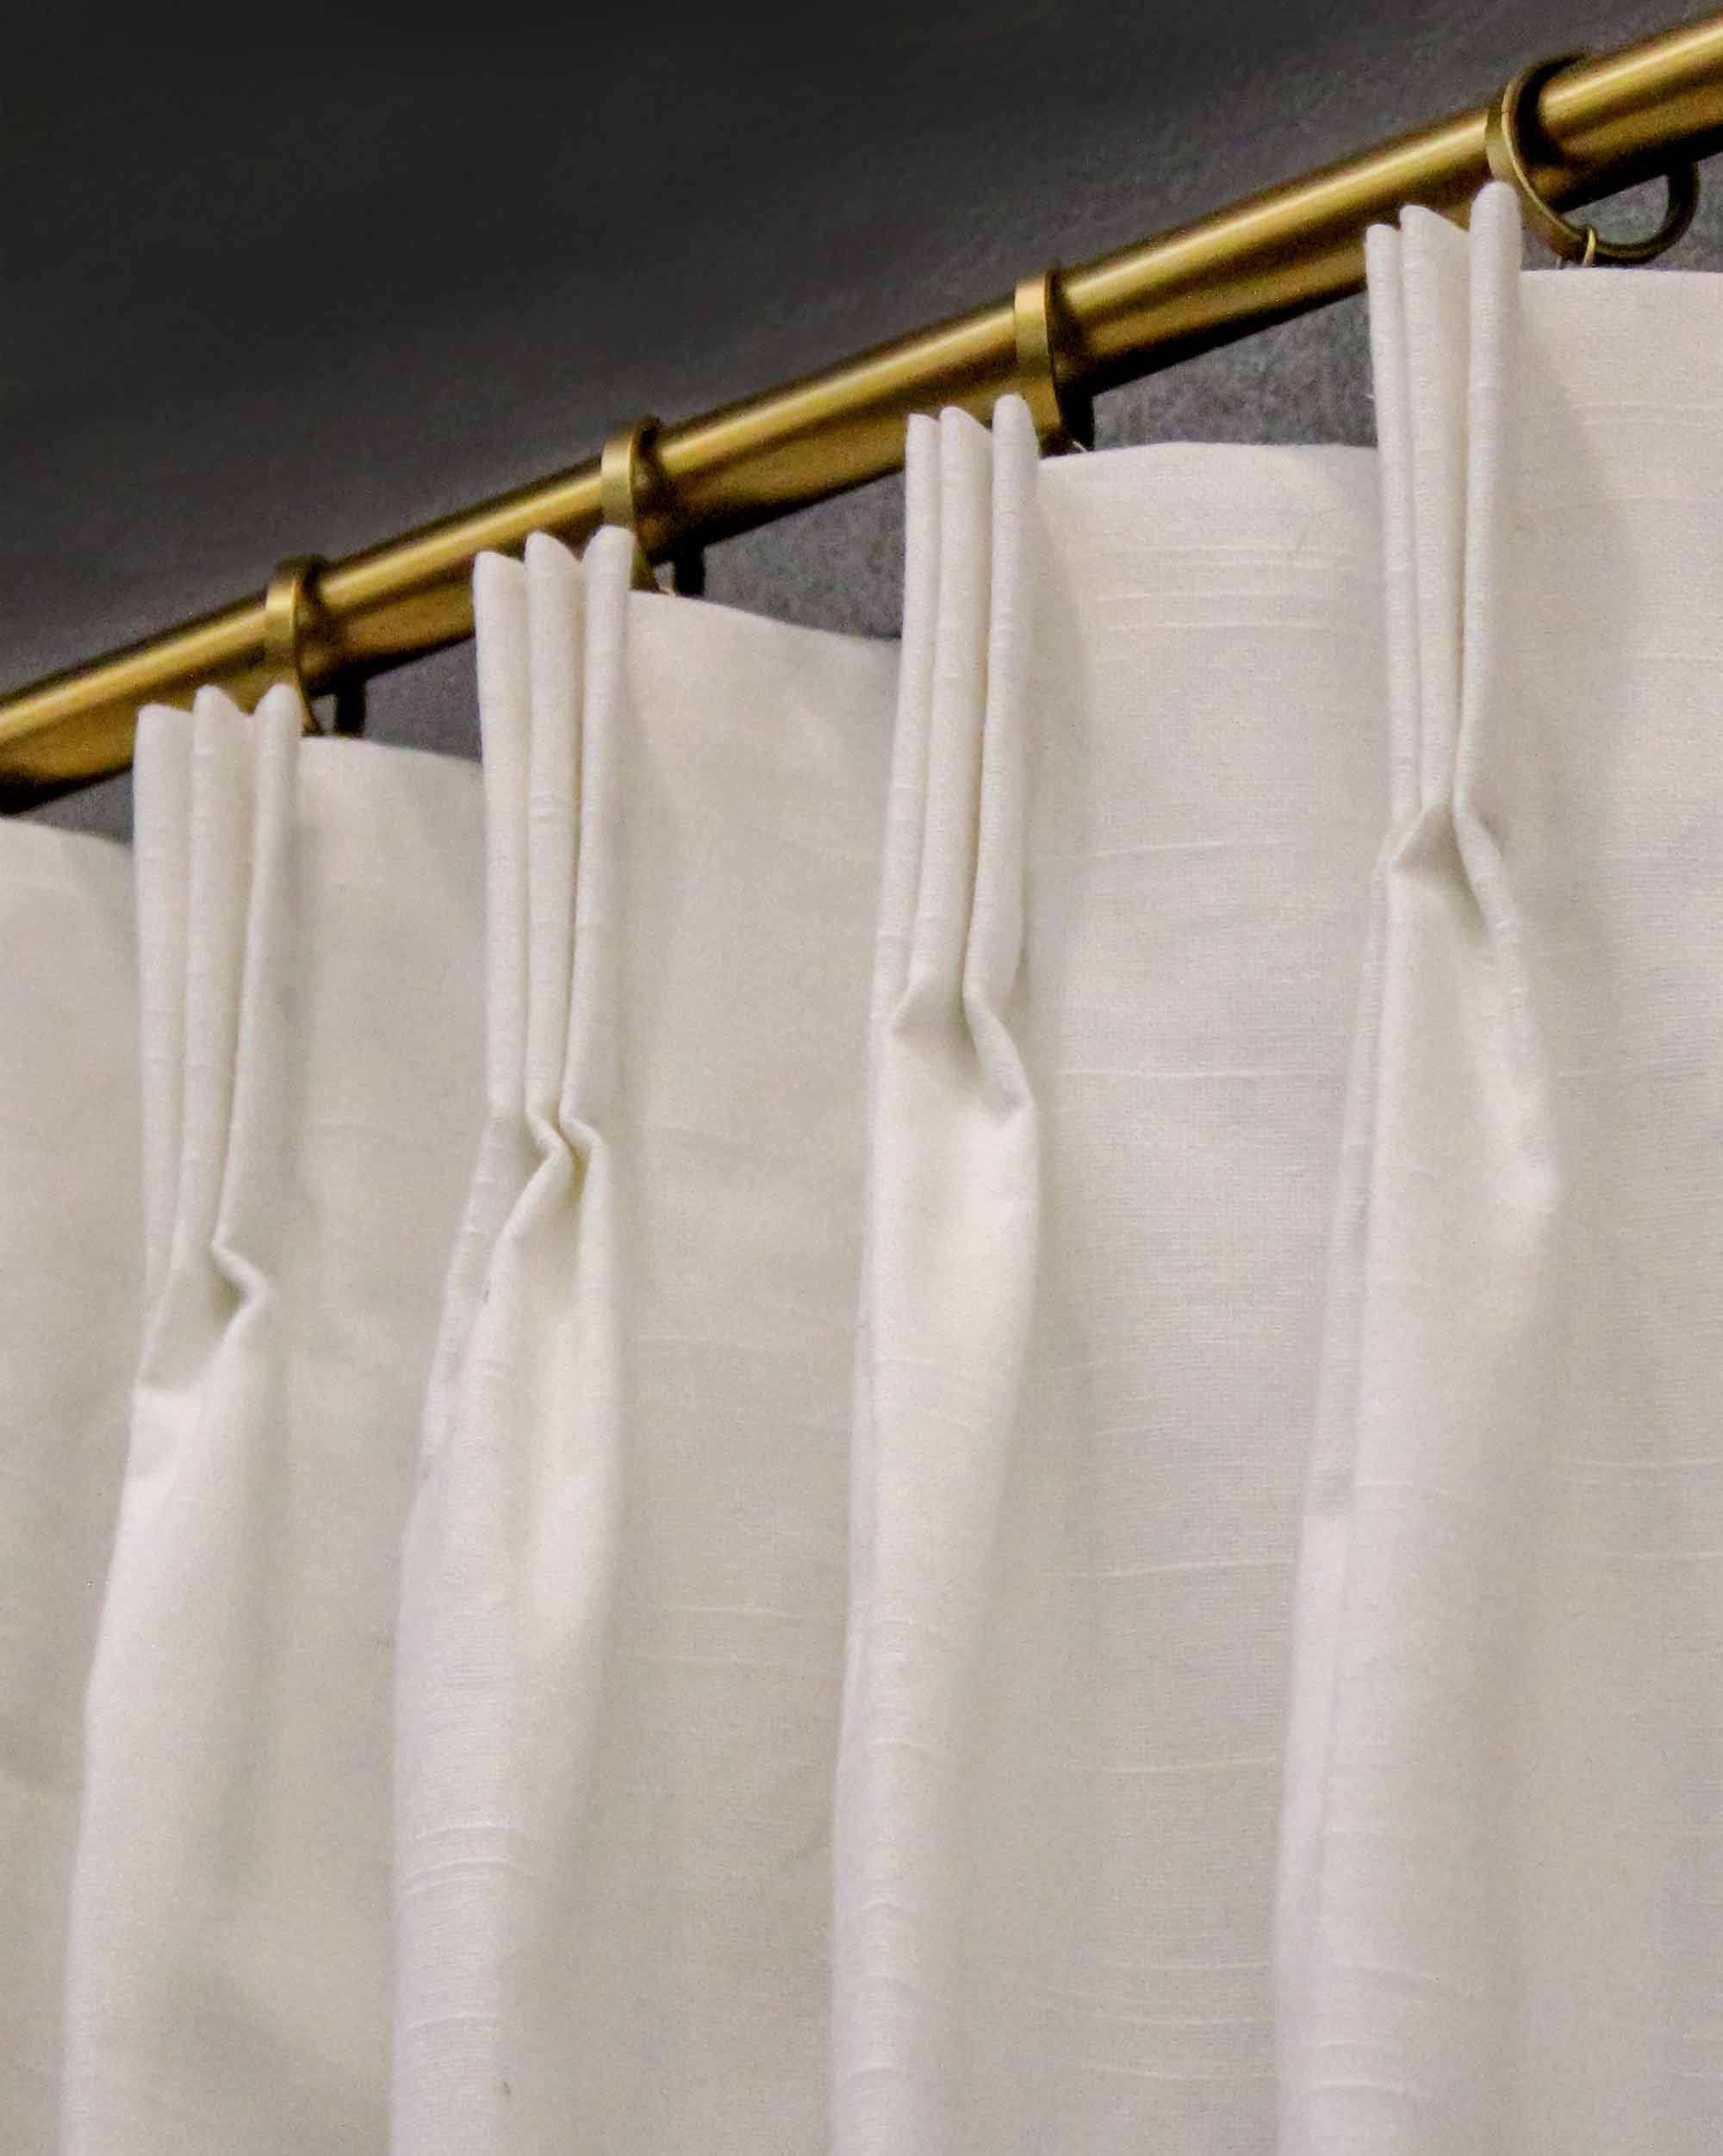 7 day custom drapes in white slub duck 2 panels